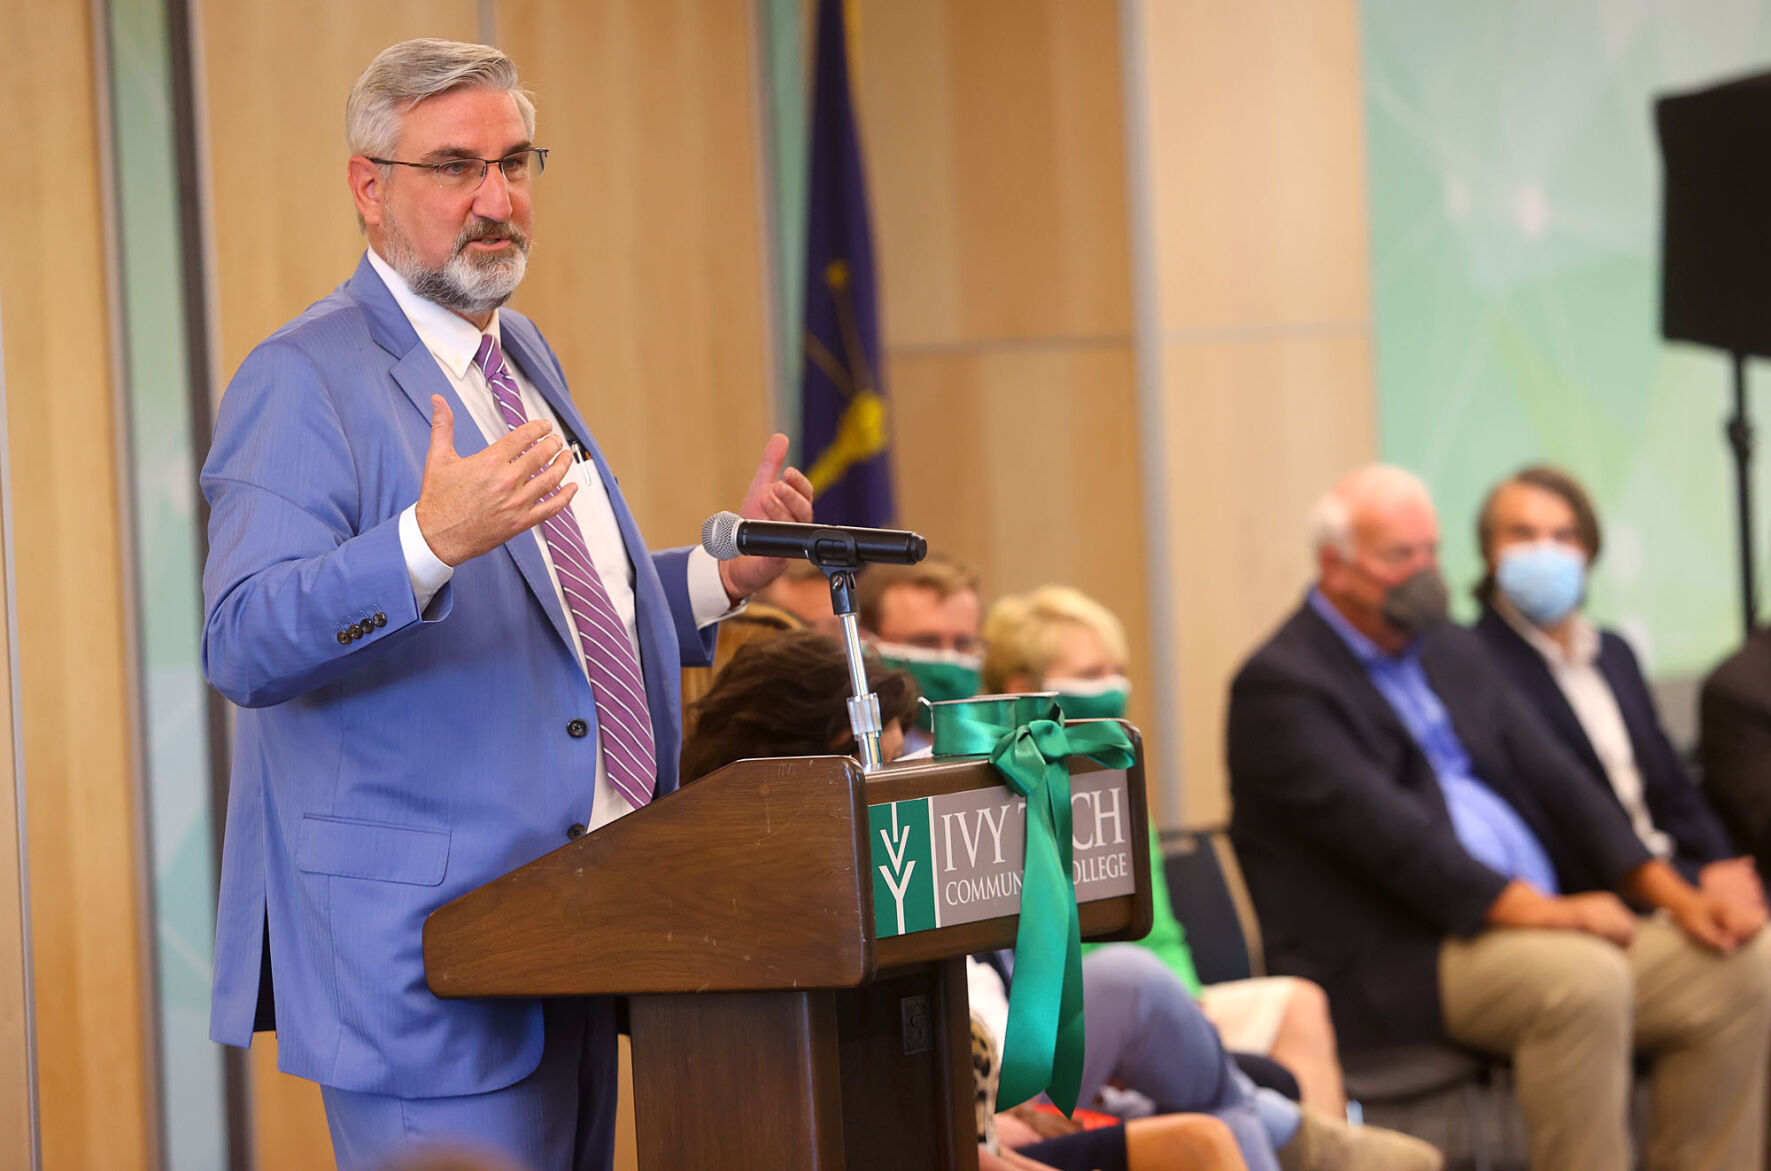 Ivy Tech celebrates new campus